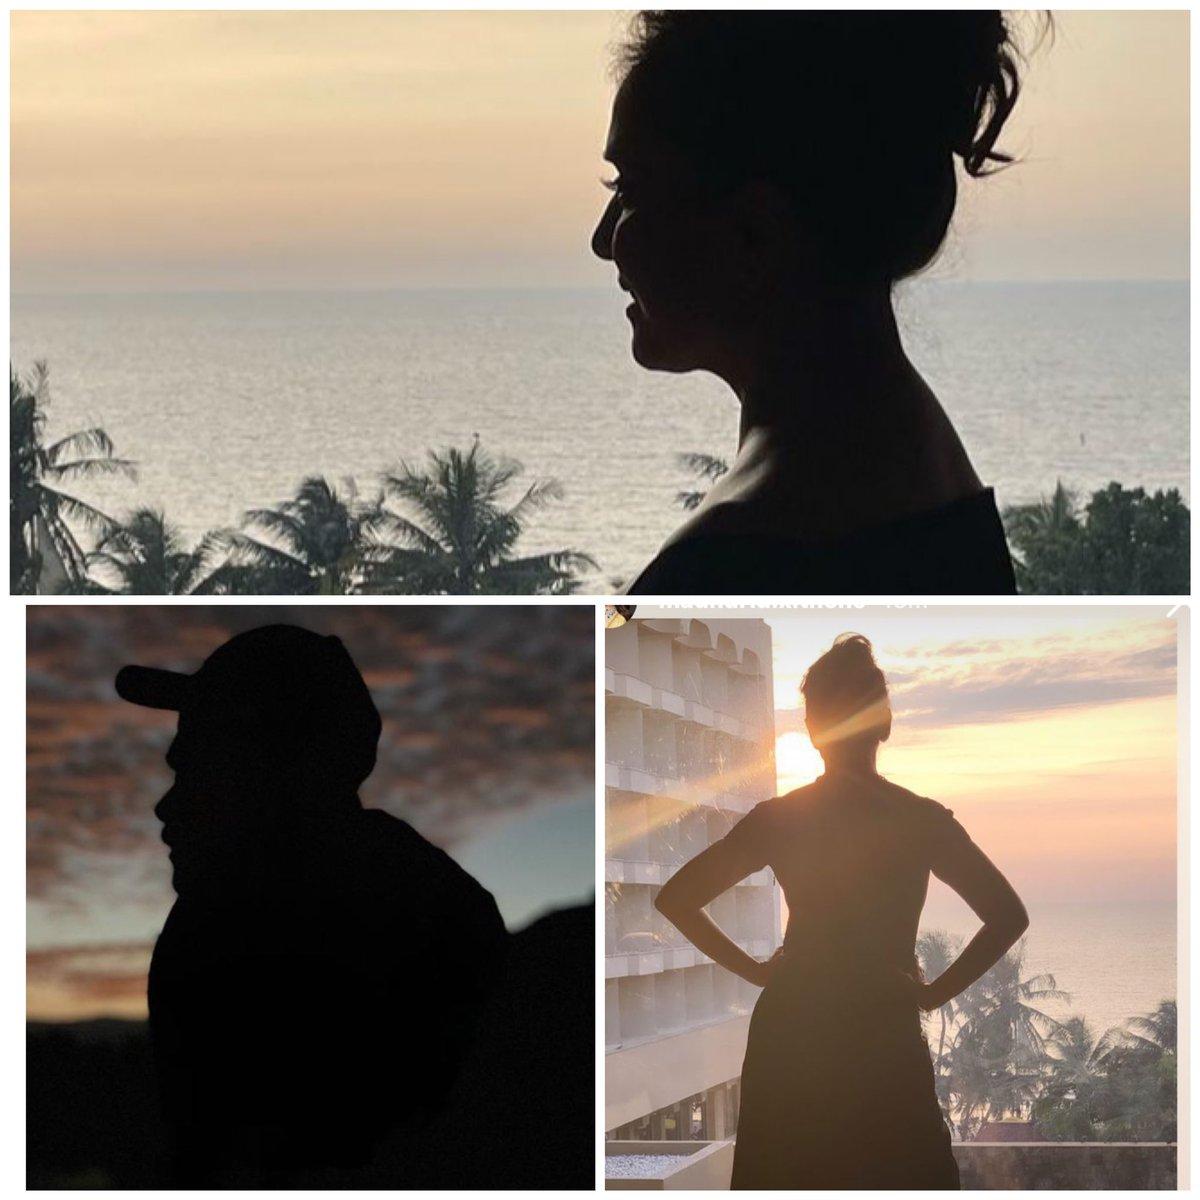 Sunset moments 🧿♥️🧿 . . #AnilKapoor #MadhuriDixit @MadhuriDixit @AnilKapoor #madnil